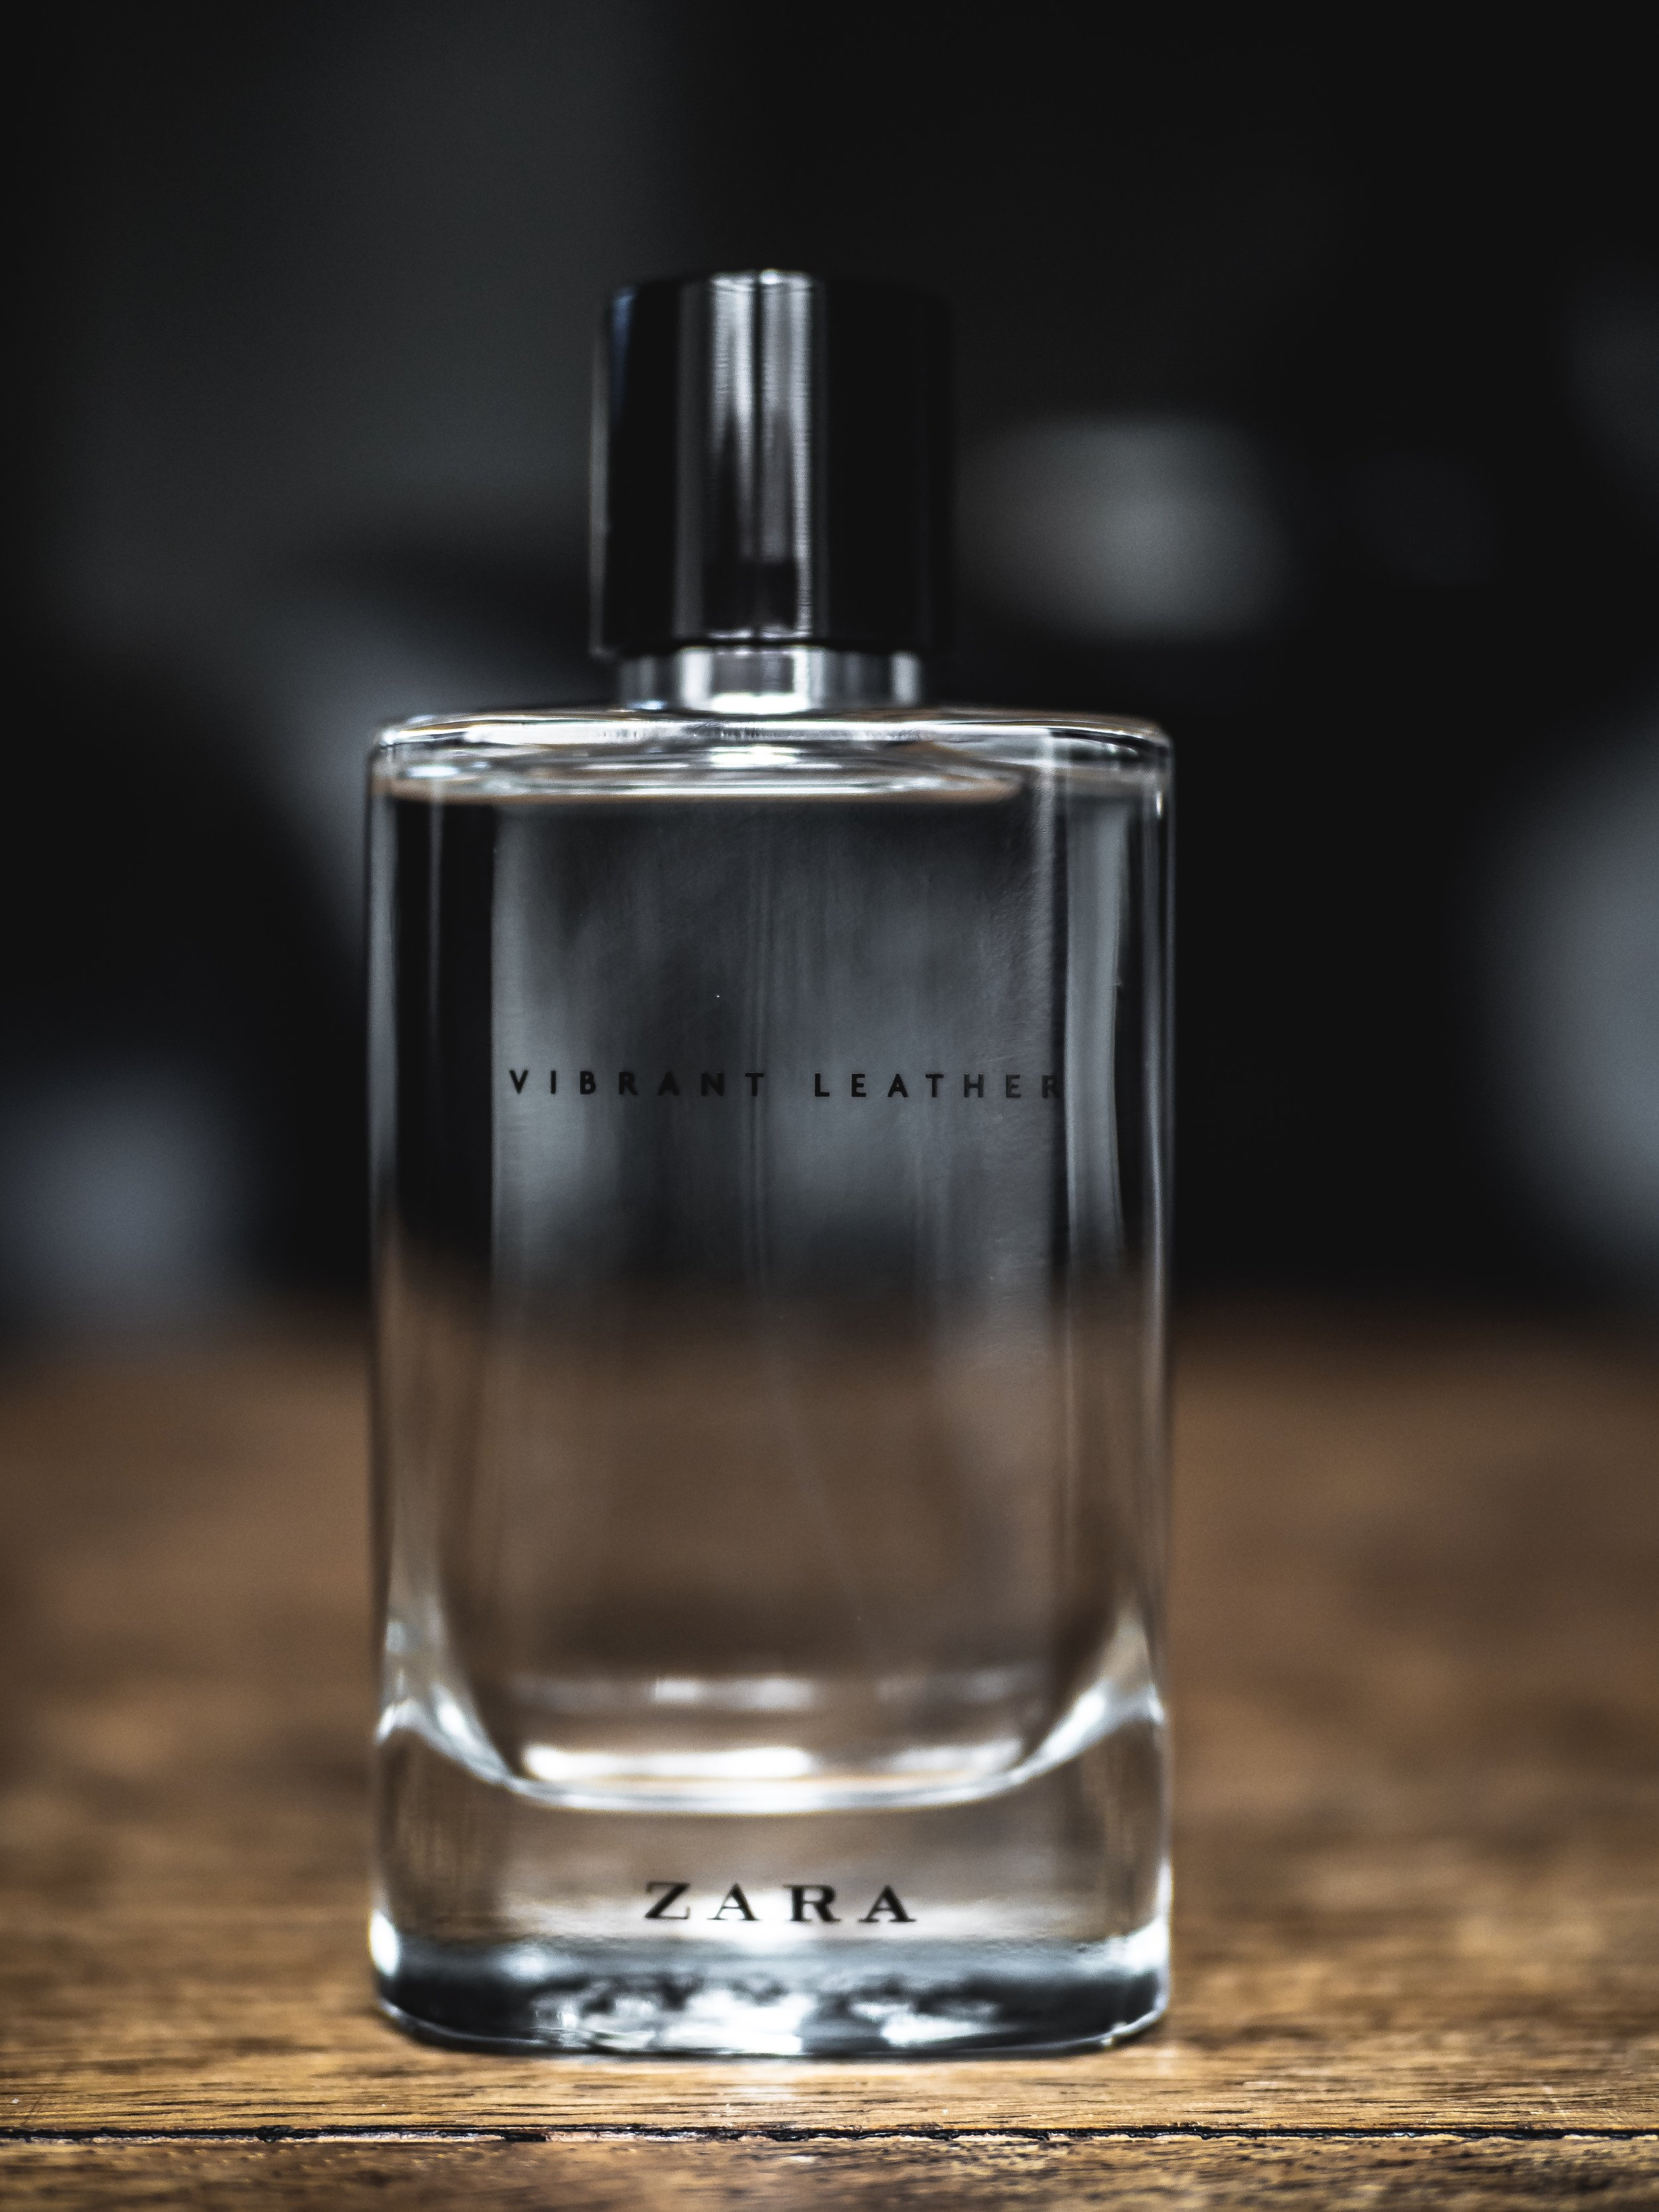 Zara Vibrant Leather Fragrance Review Jerome Epinette Cheap High Street